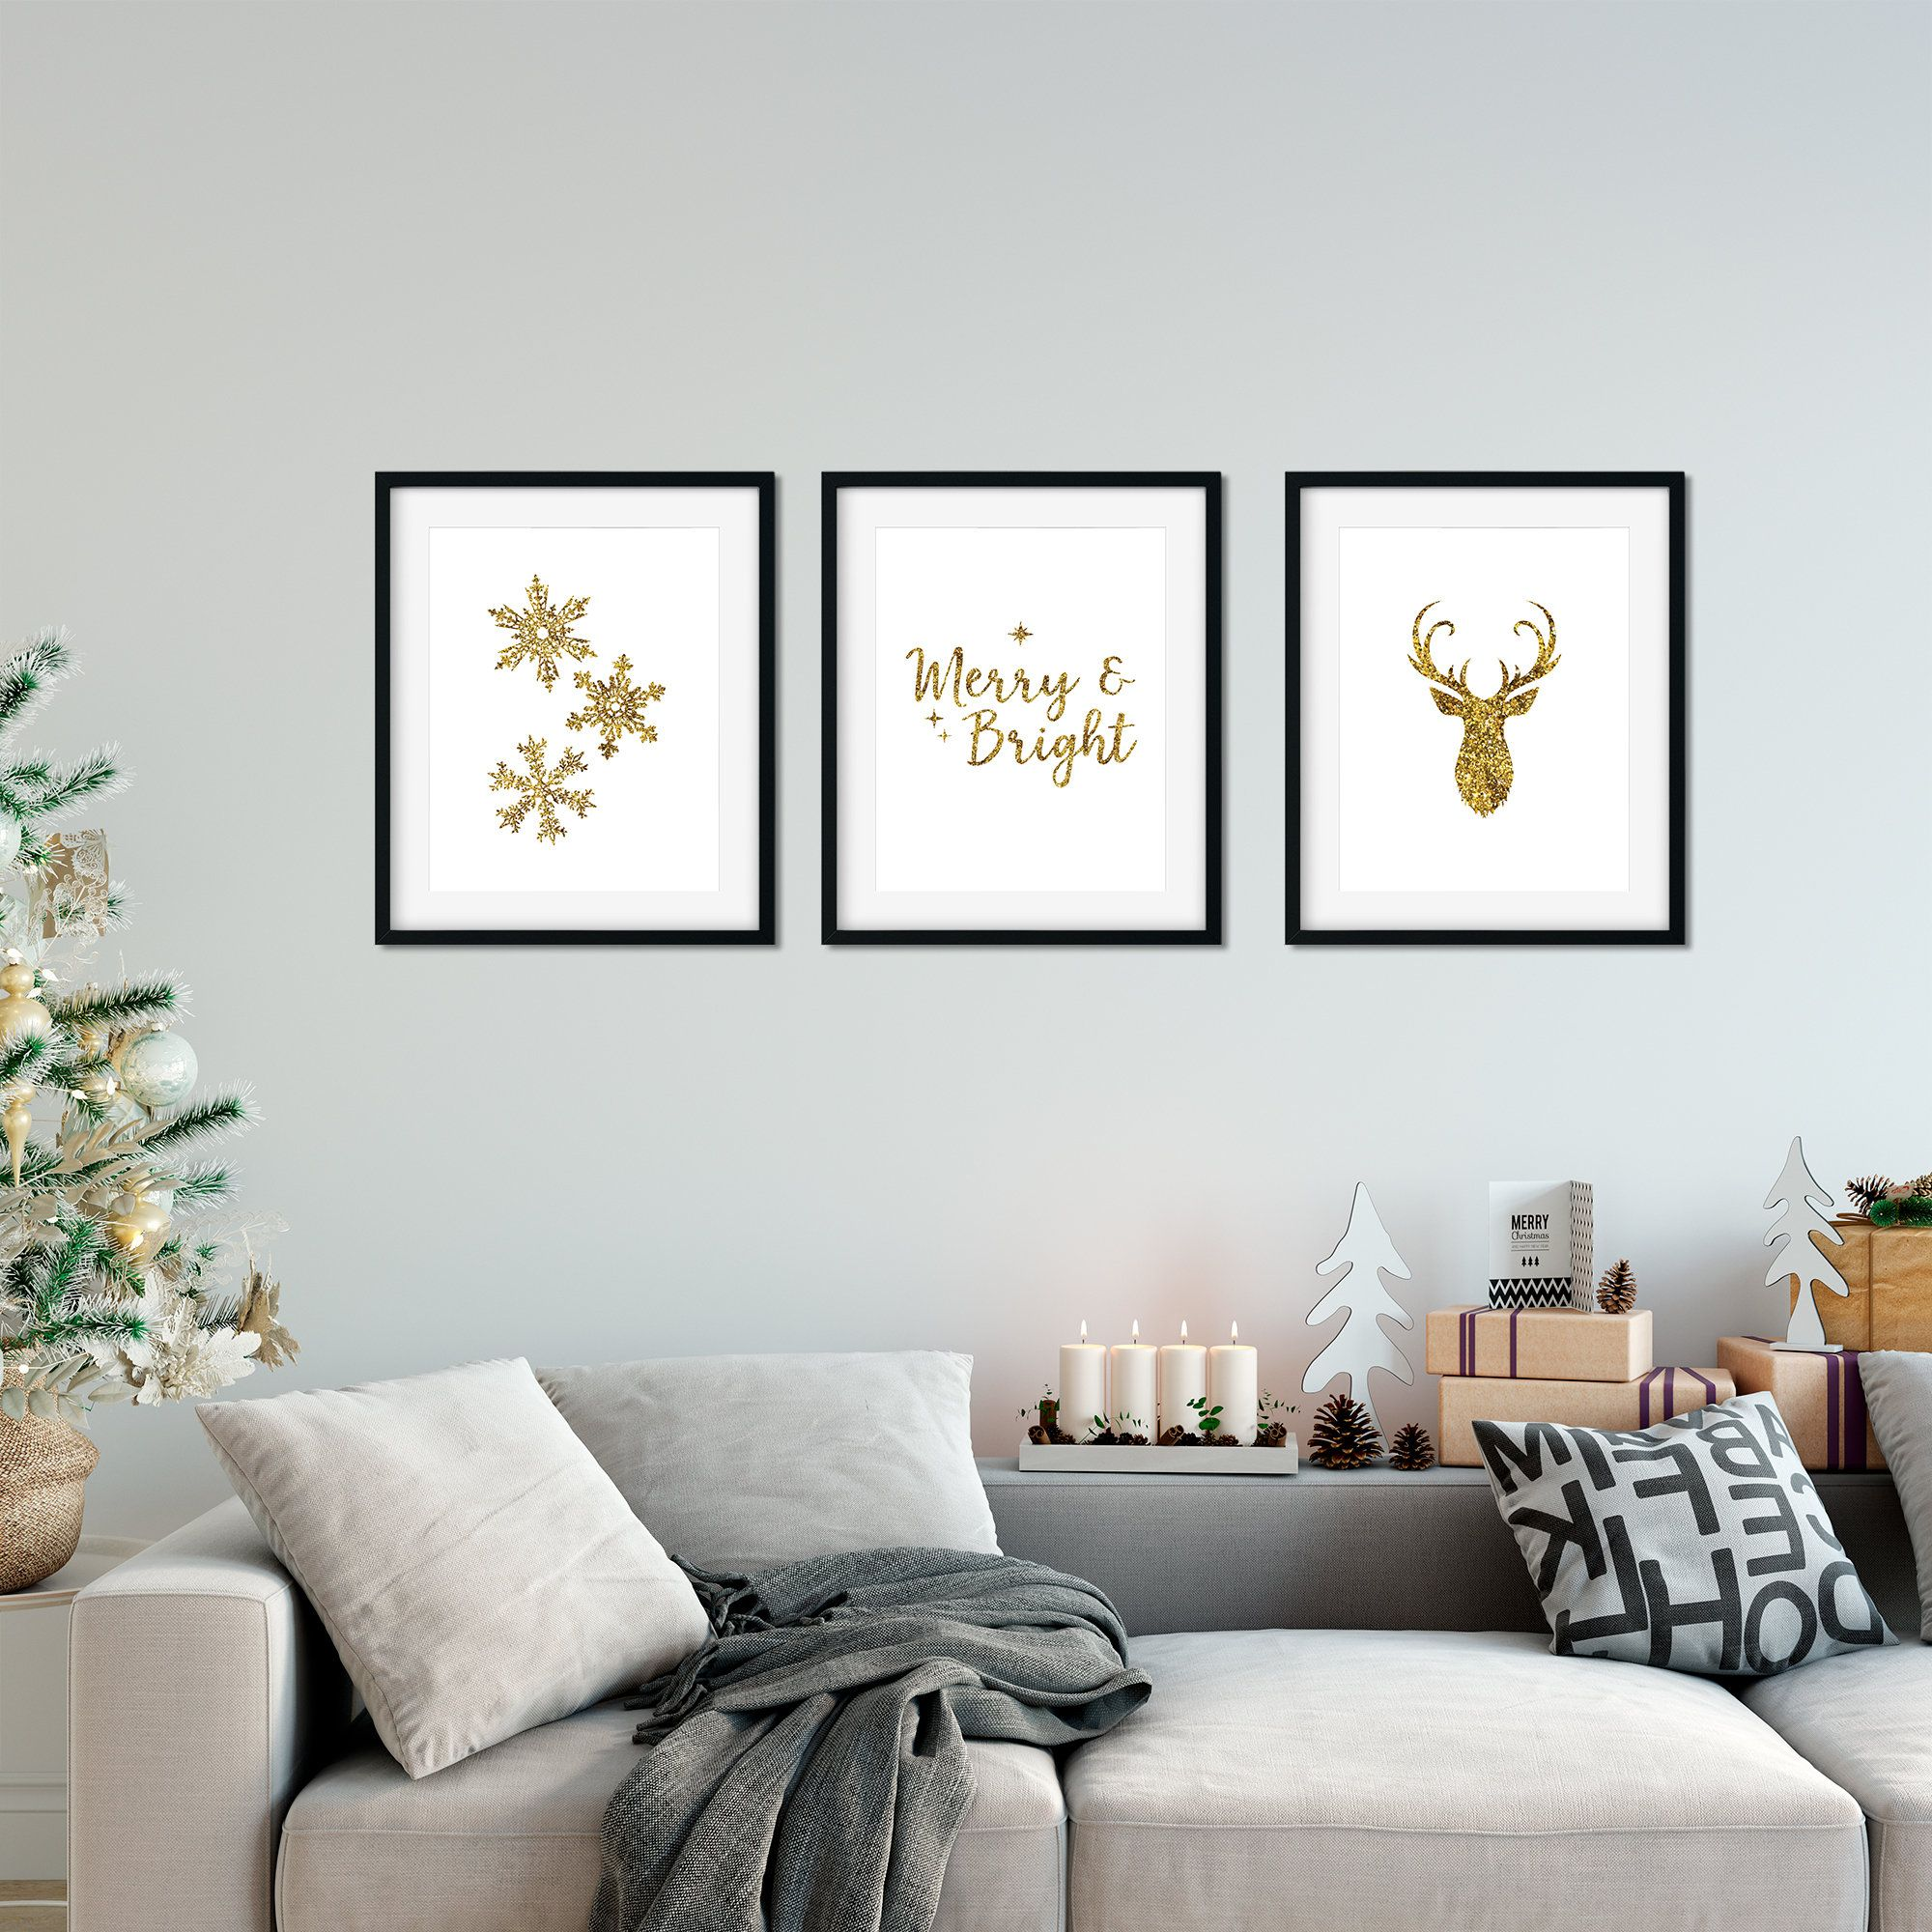 Gold Christmas Printables Set Of 3 Glitter Gold Christmas Wall Art Christmas Wall Decor Holiday De Christmas Wall Decor Snowflakes Wall Decor Gold Christmas